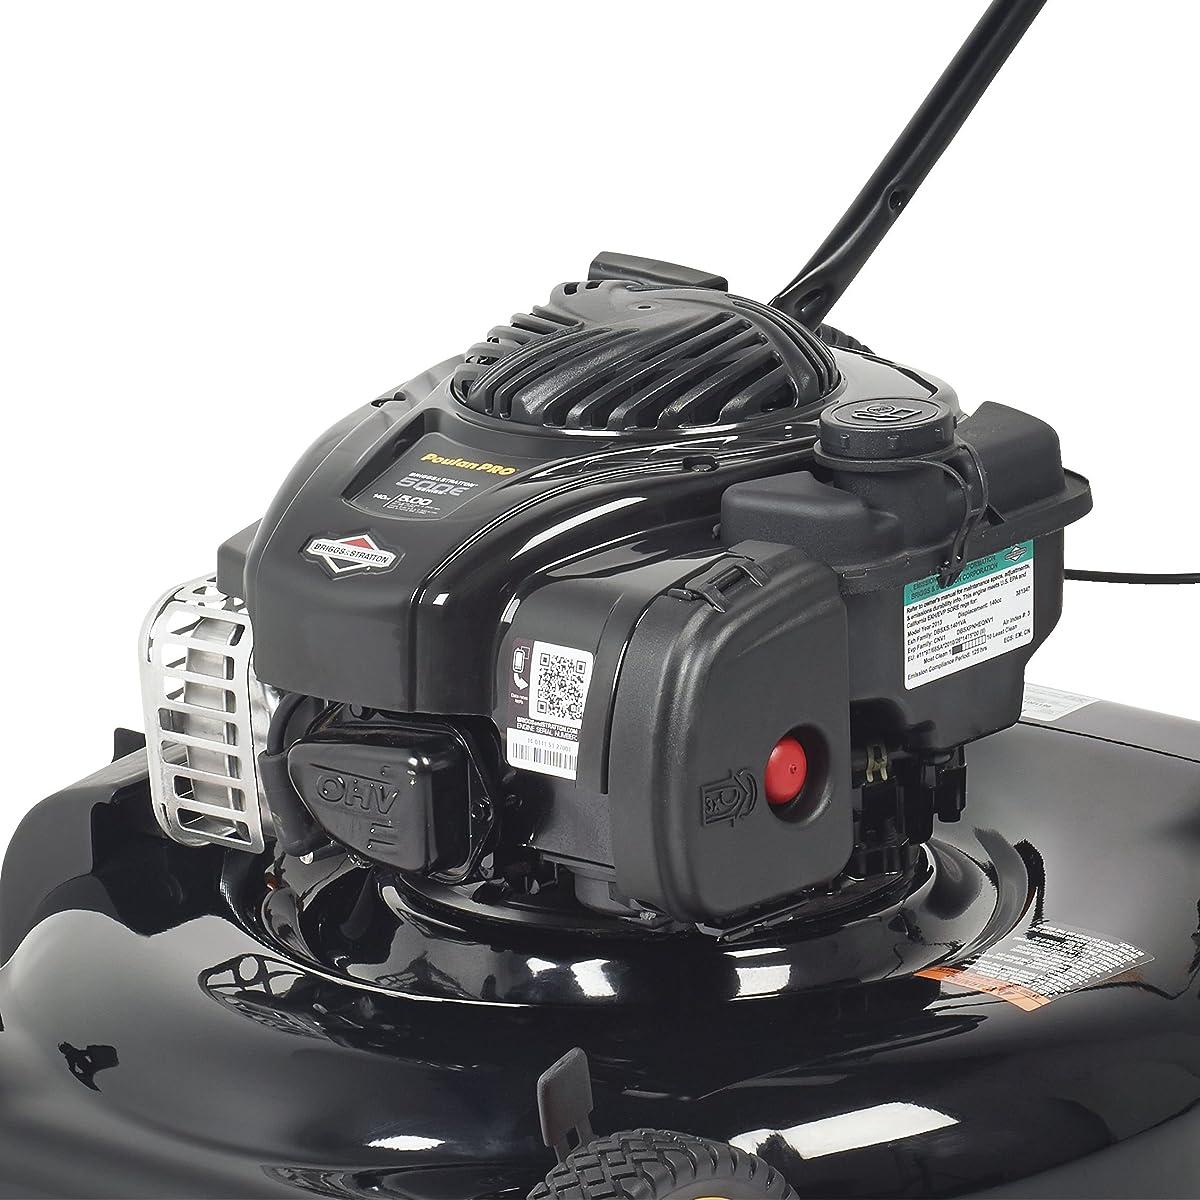 Poulan Pro 961120134 PR500N21SH Briggs 500ex Side Discharge/Mulch 2-in-1 Hi-Wheel Push Mower in 21-Inch Deck, 11-inch wheels